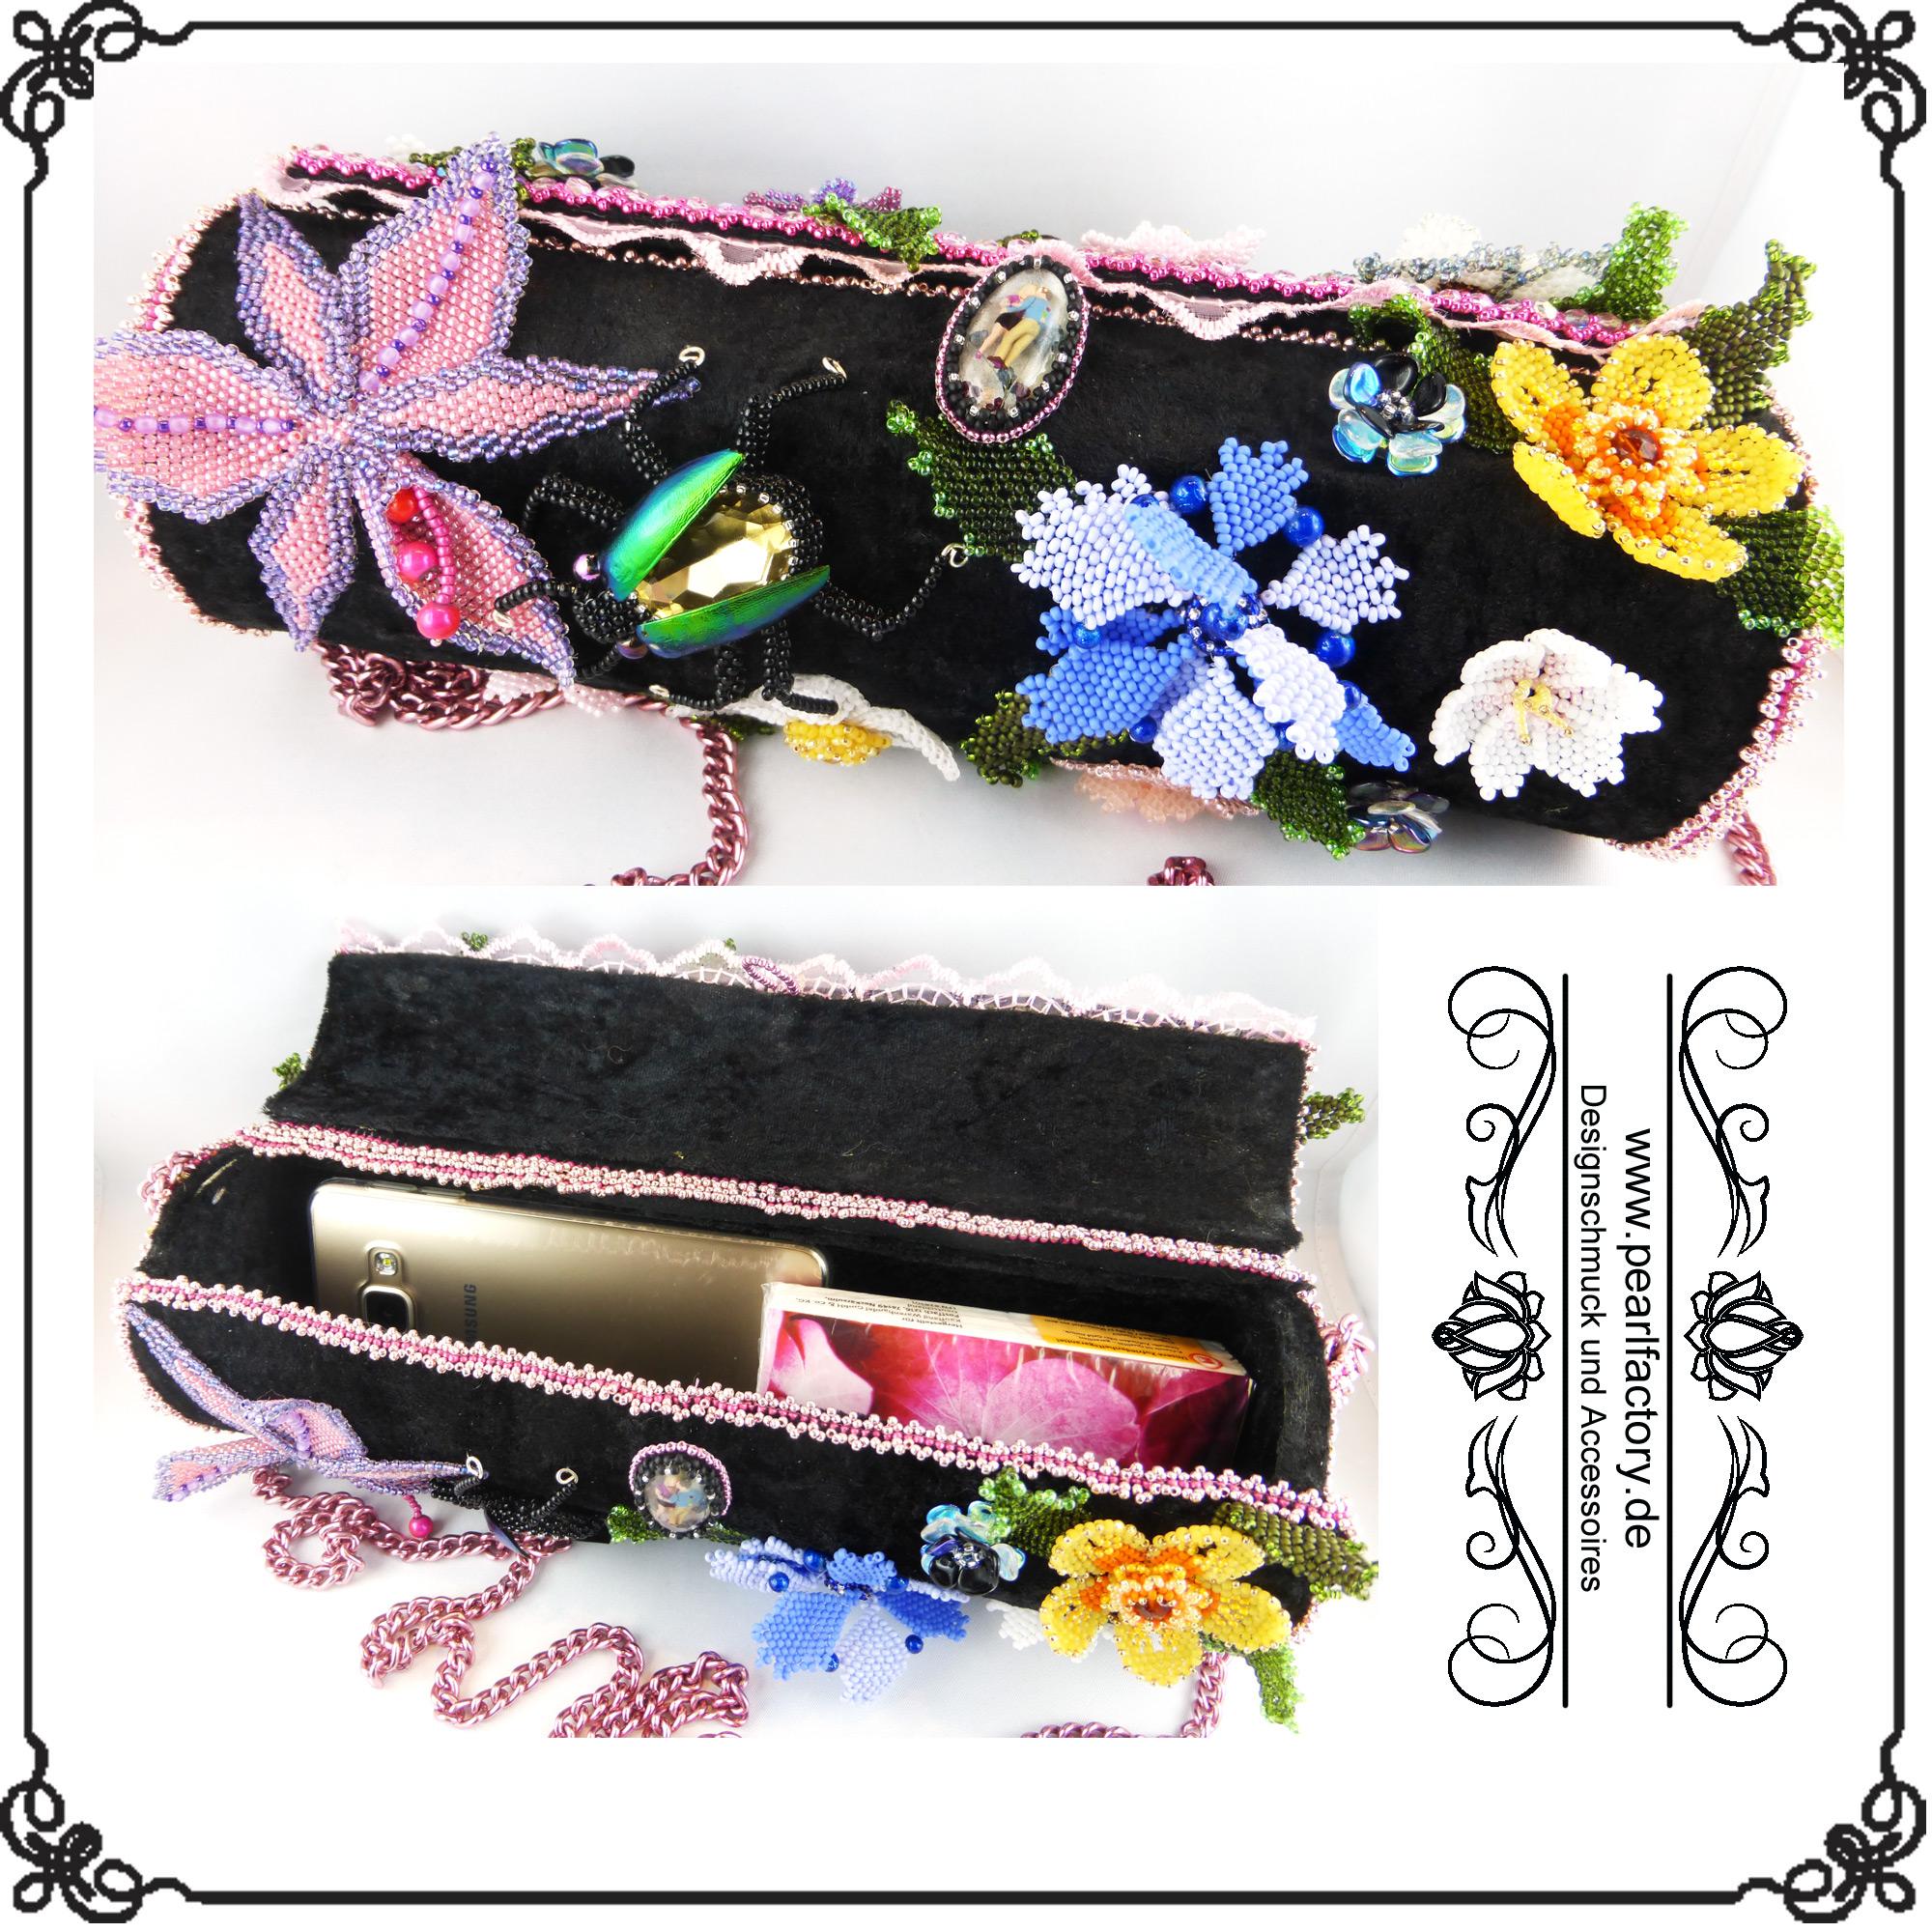 Damen Handtasche Blumen Bead Embroidery